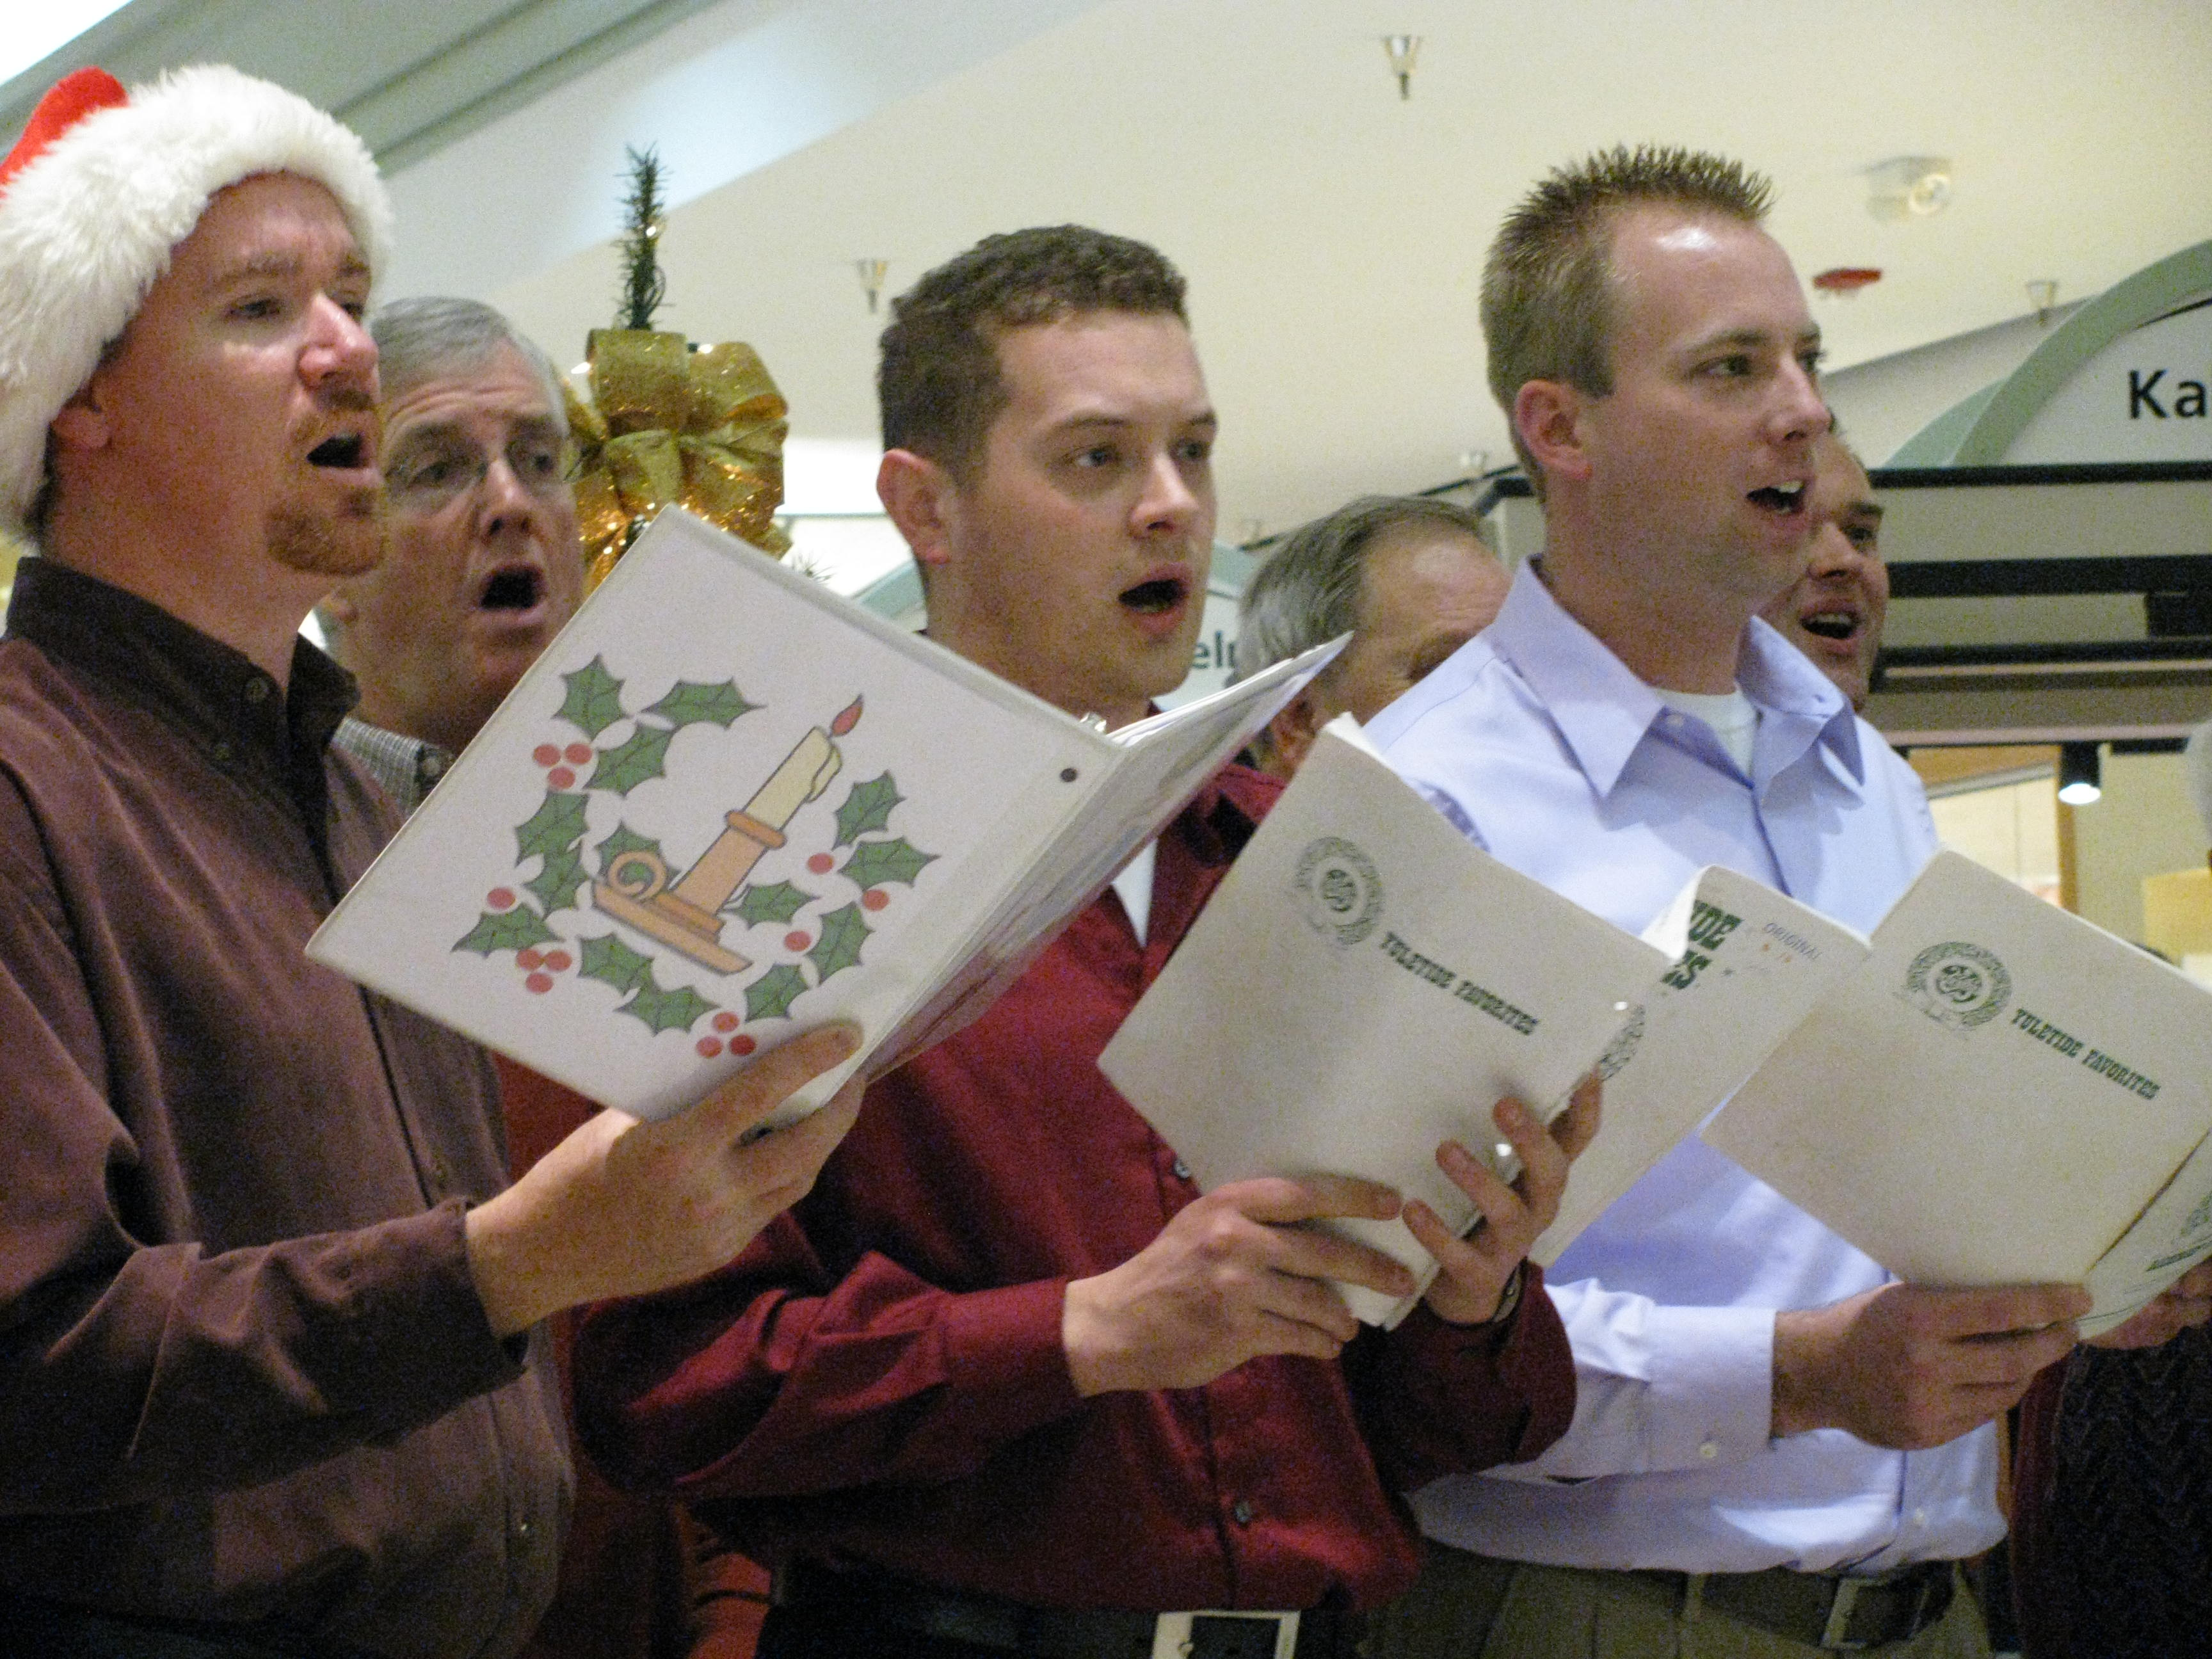 Each Christmas season the Hawks share holiday cheer with their seasonal songs.